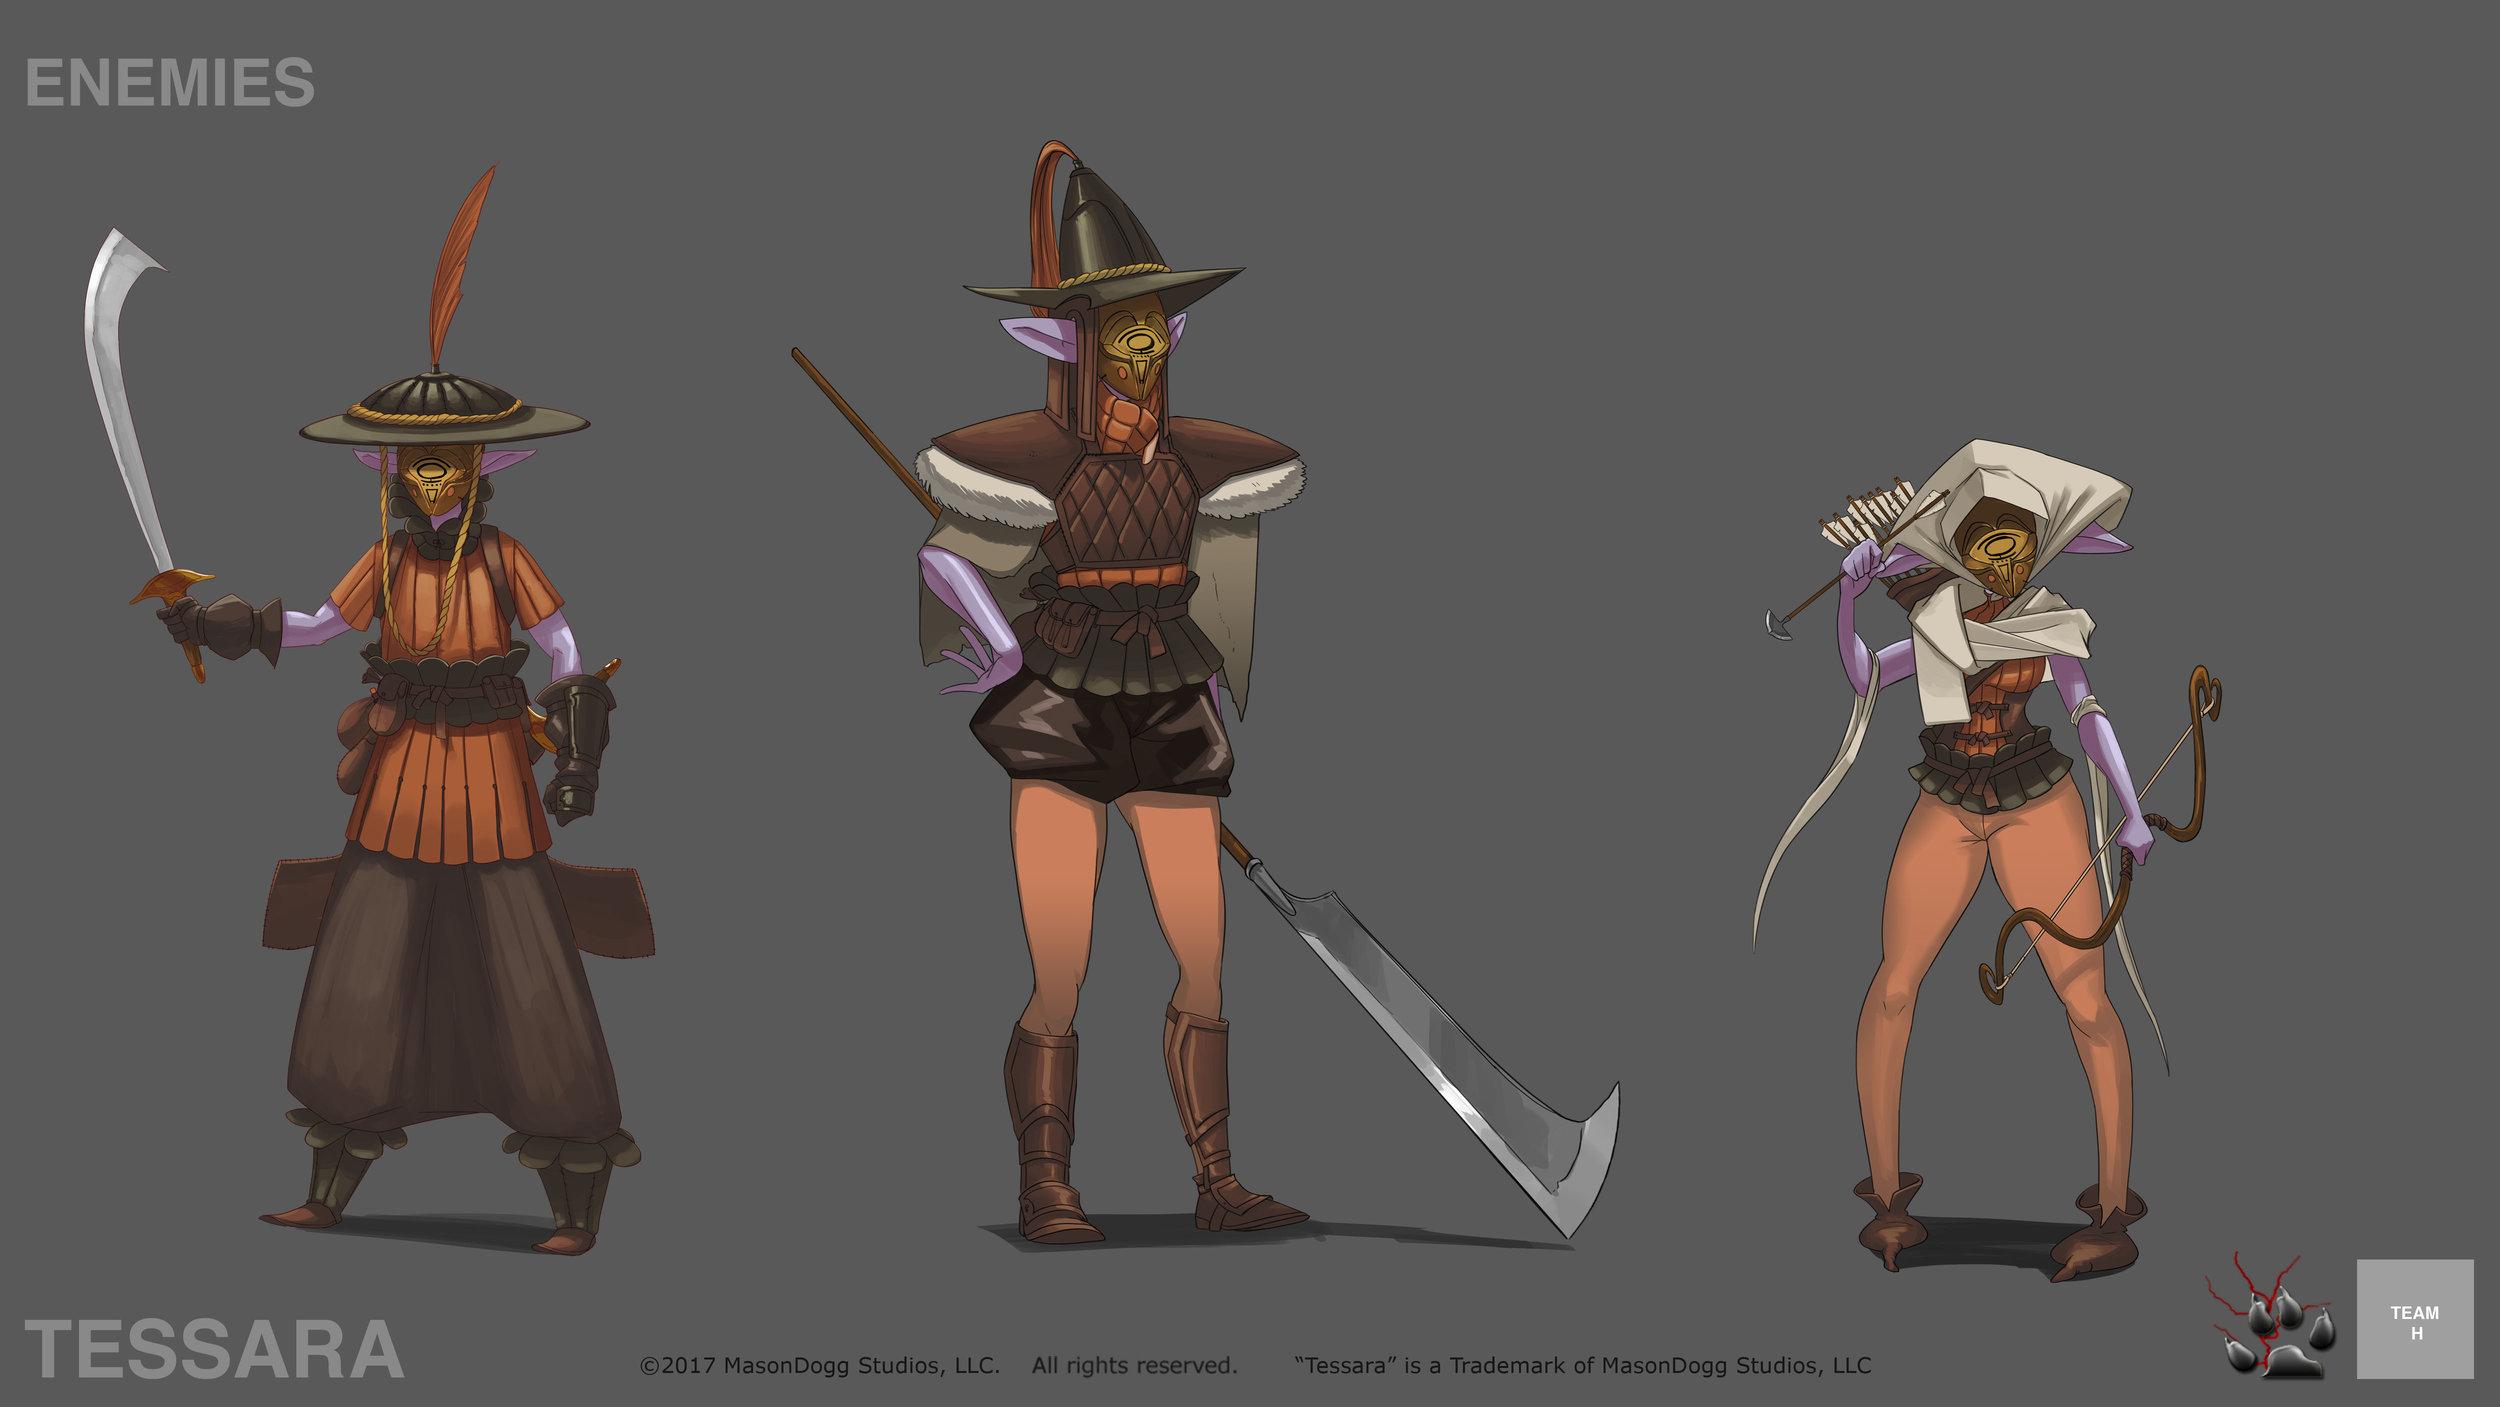 Enemy soldier designs